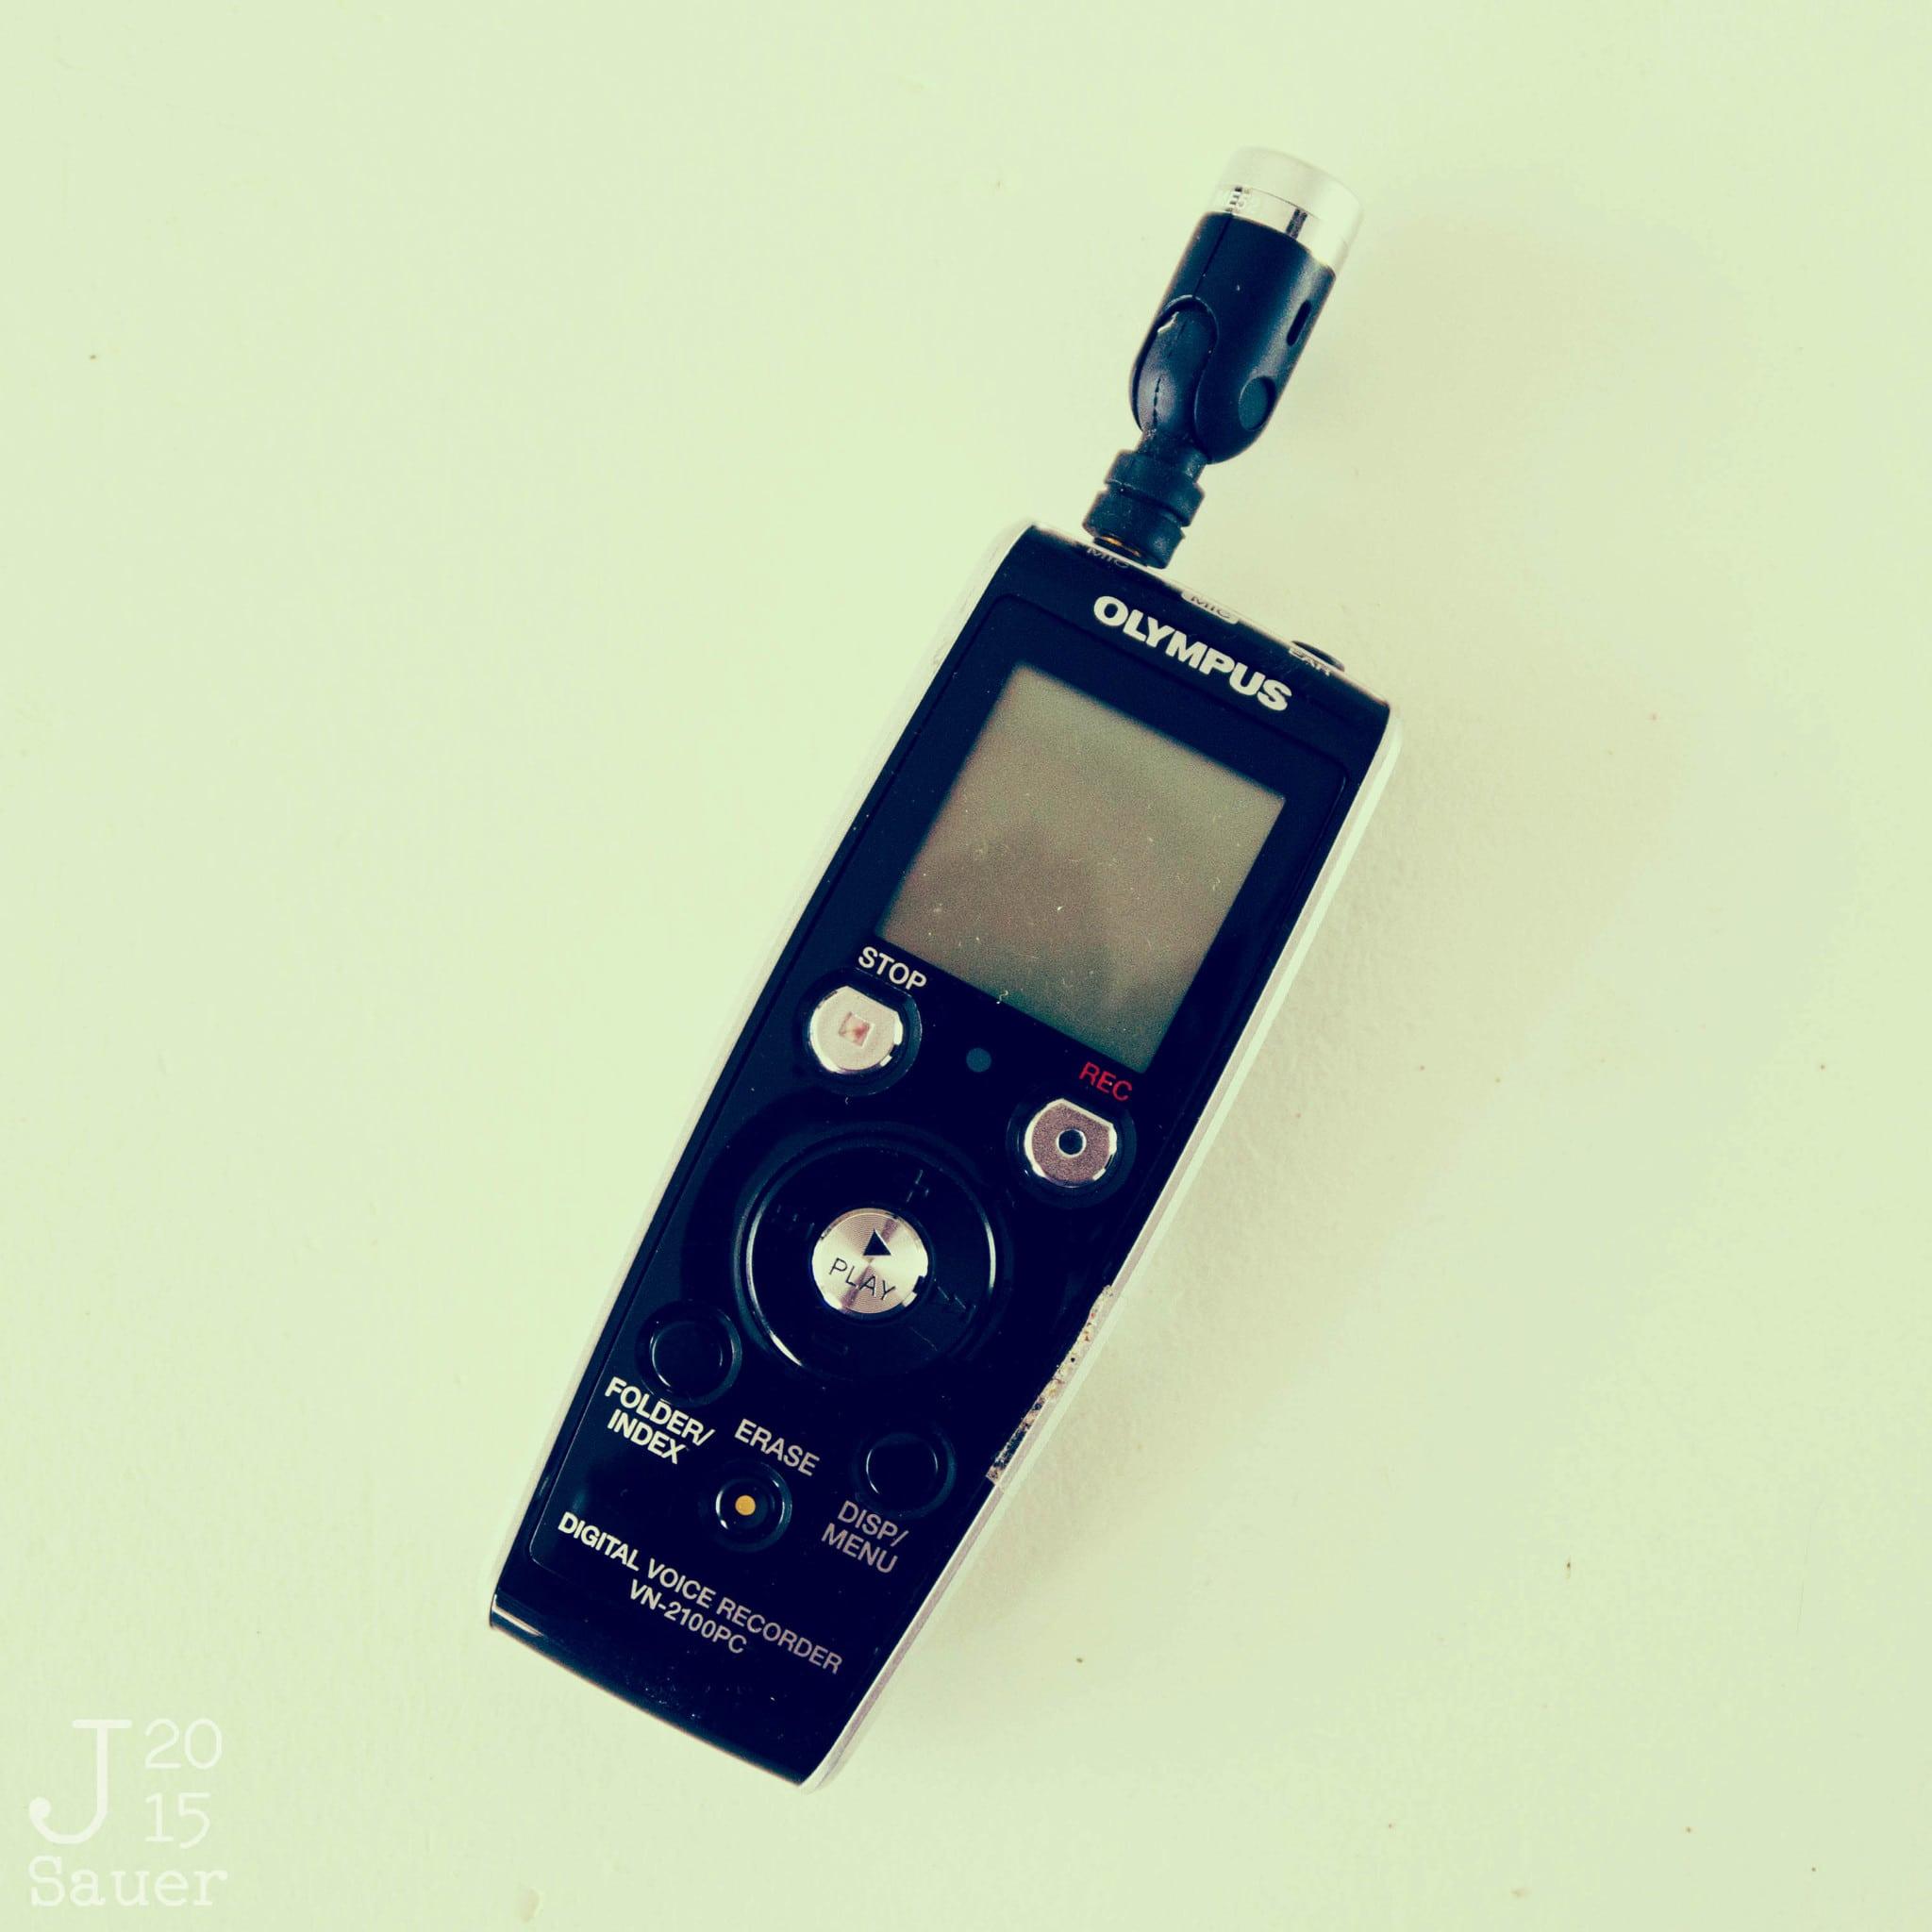 Tekstbureau 't Kofschaap voicerecorder lomo